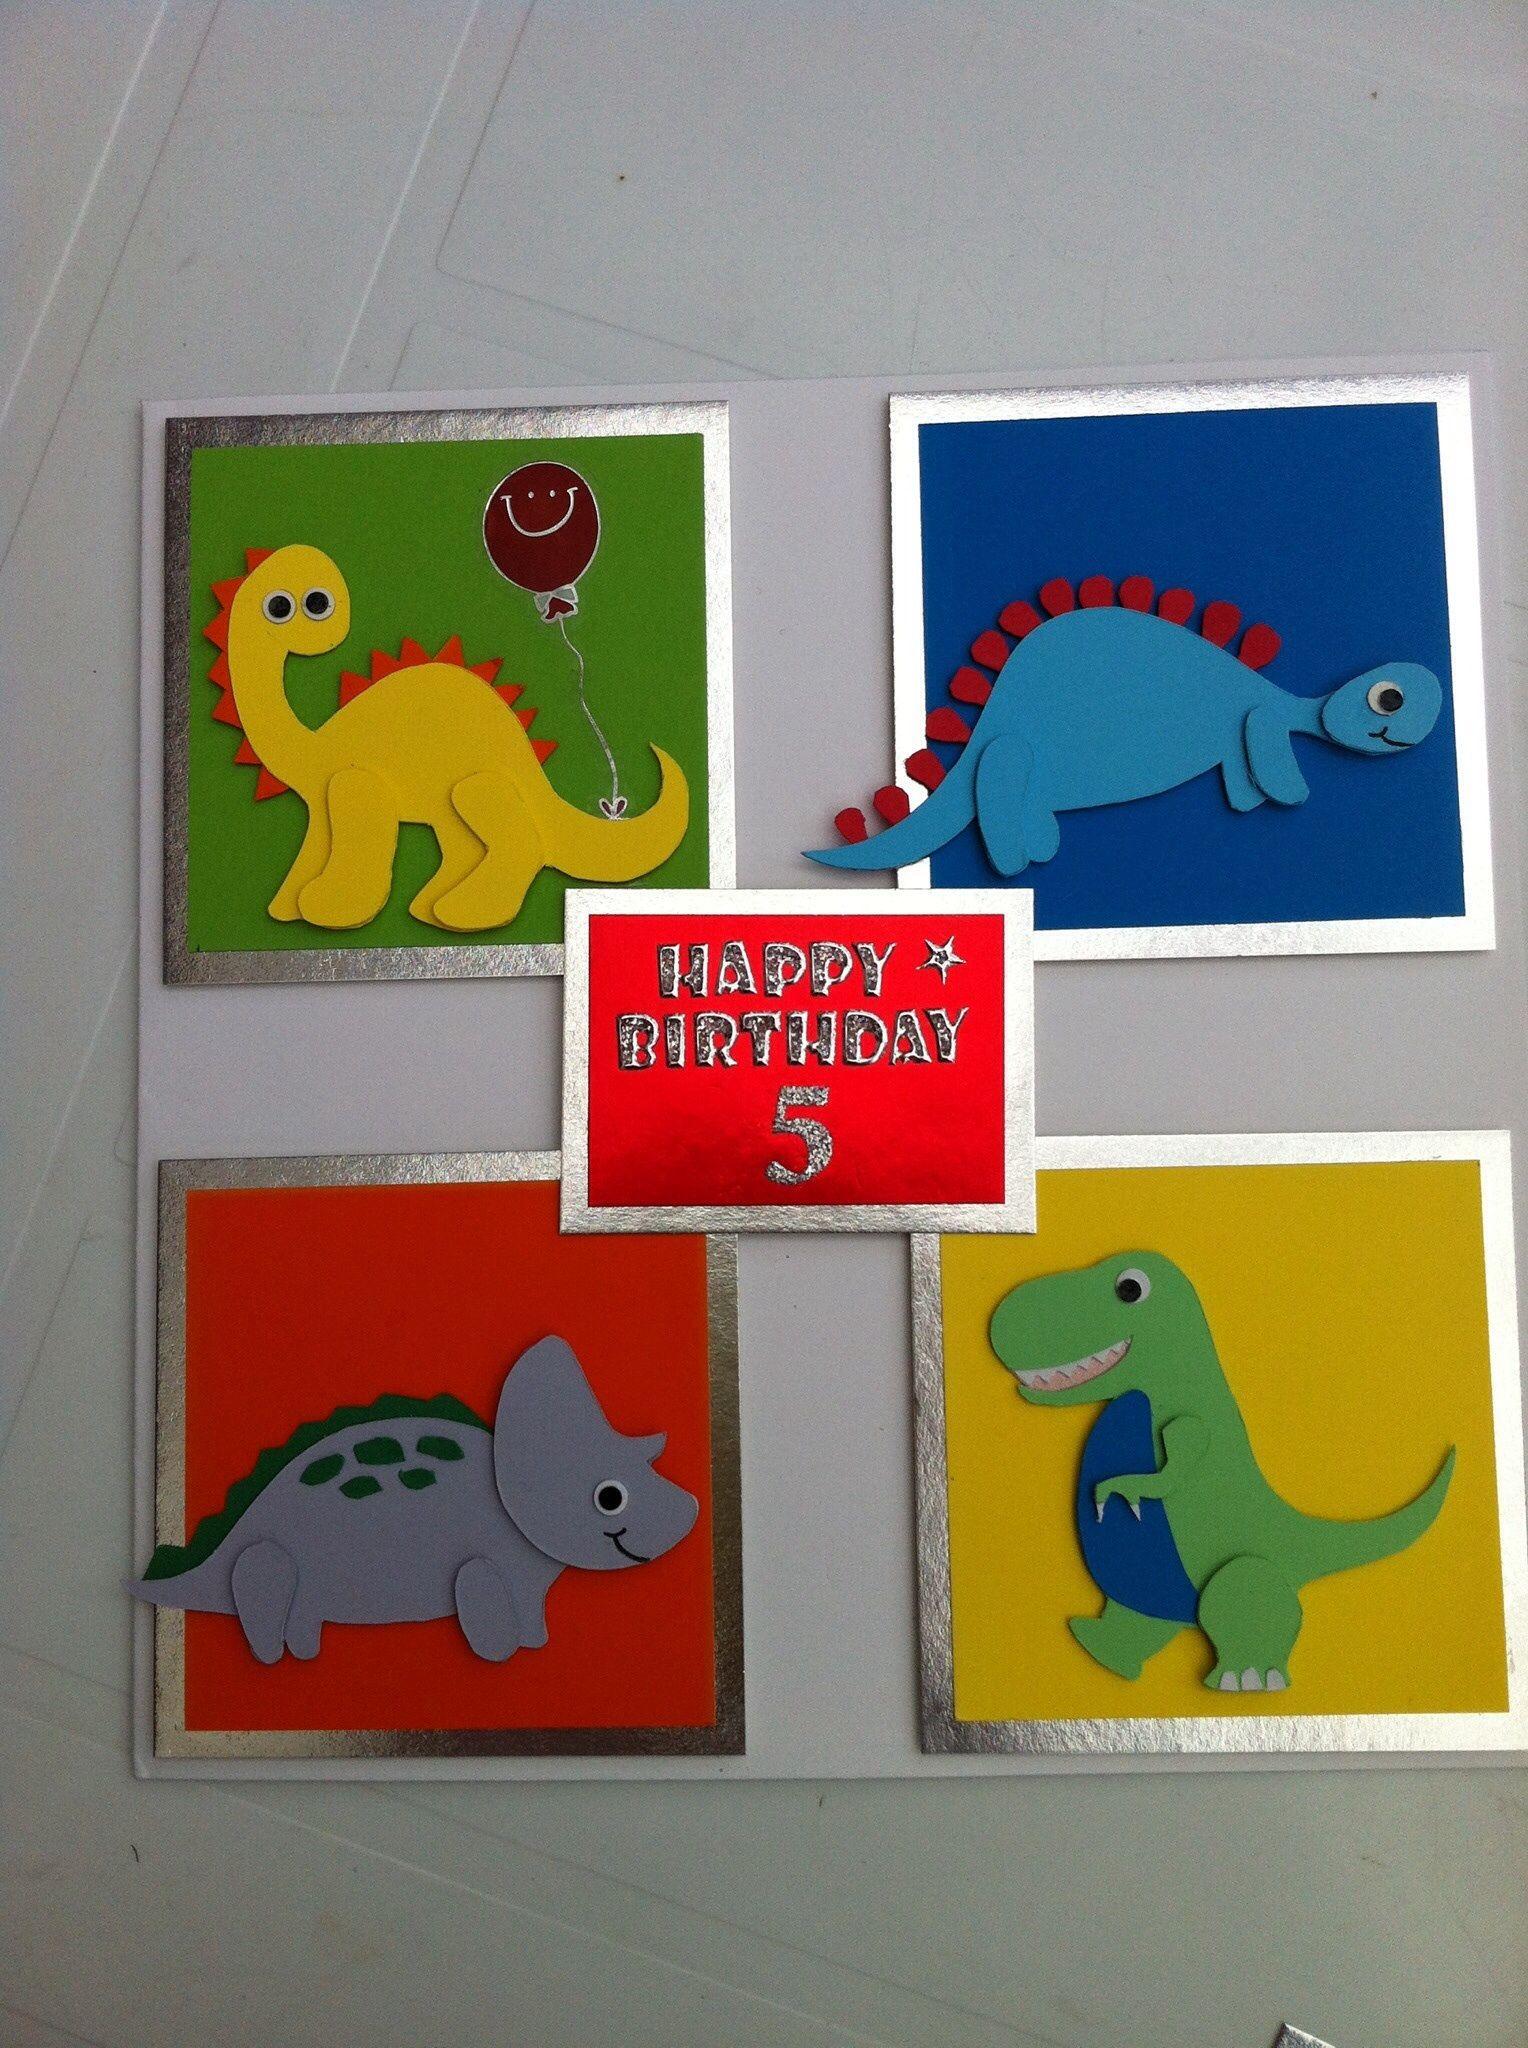 Handmade Childrens Birthday Card By Nicki Noo Childrens Cards